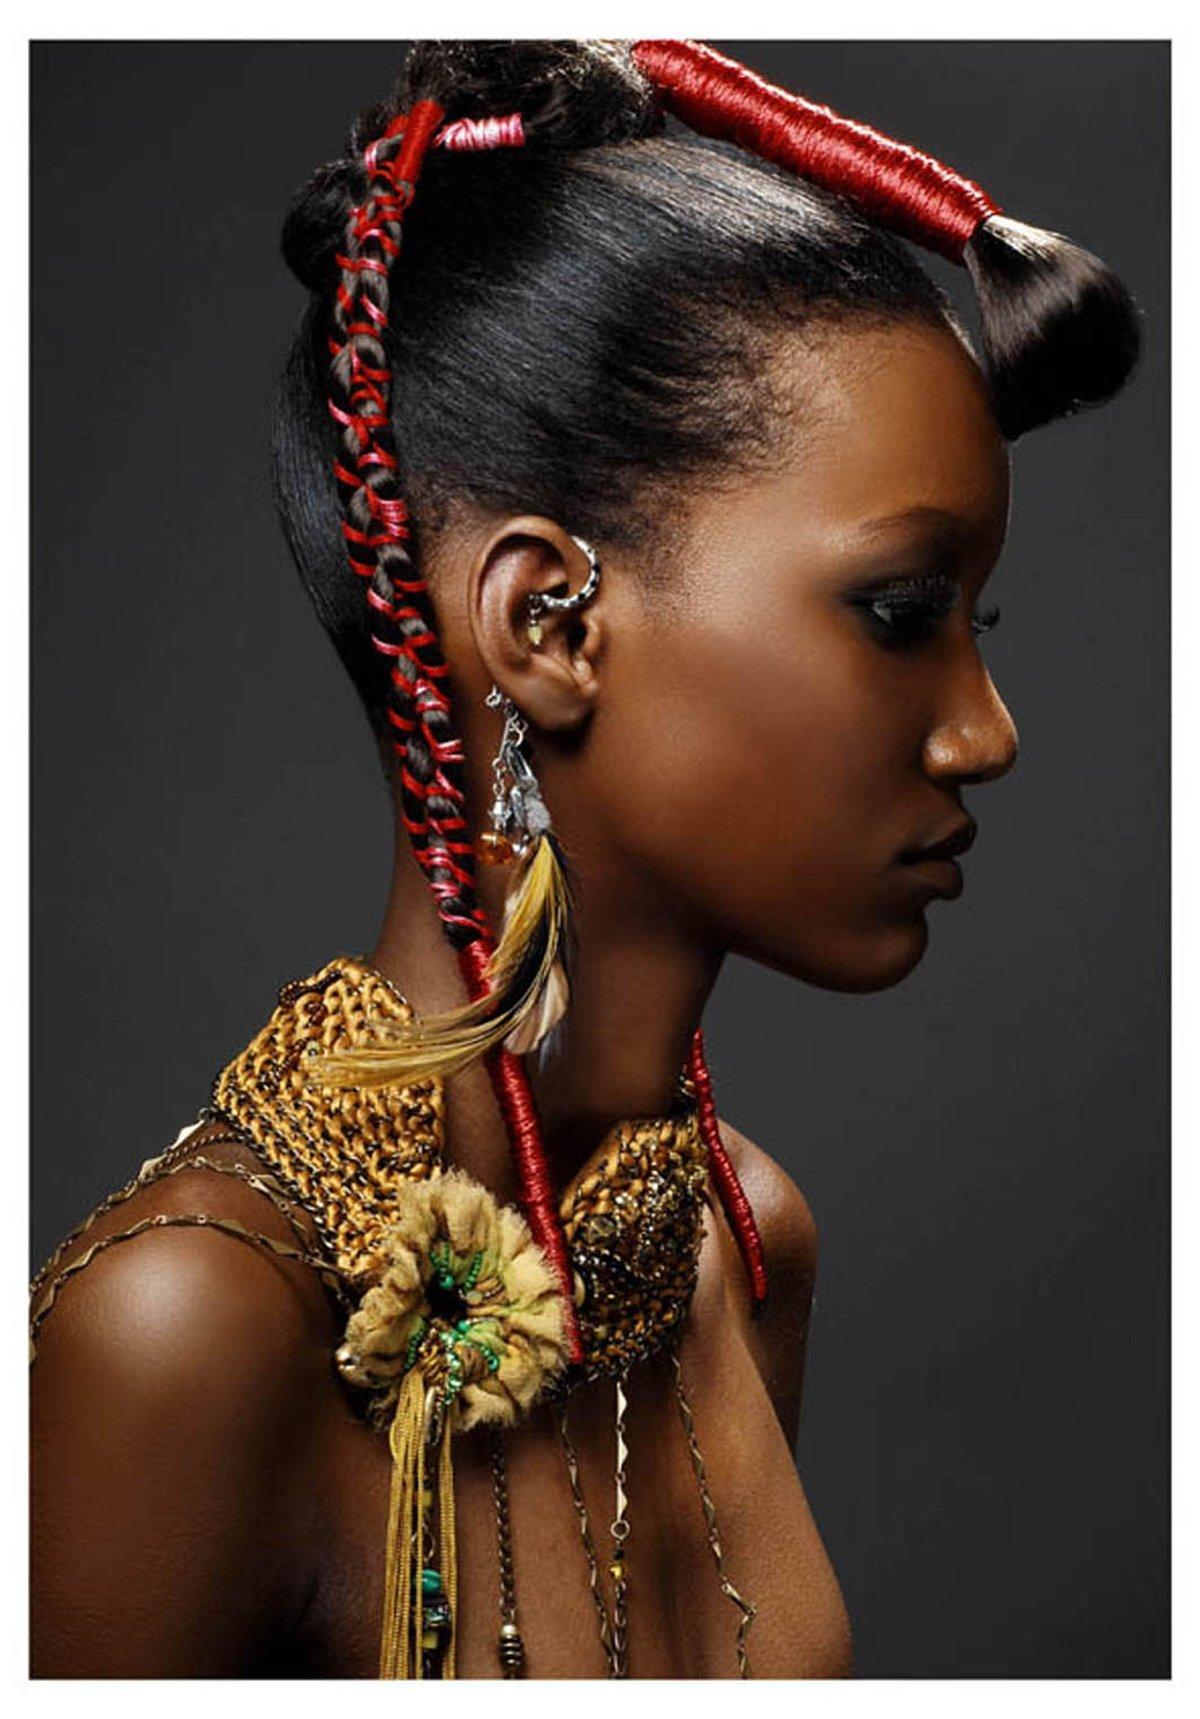 фото подборка африканки - 8